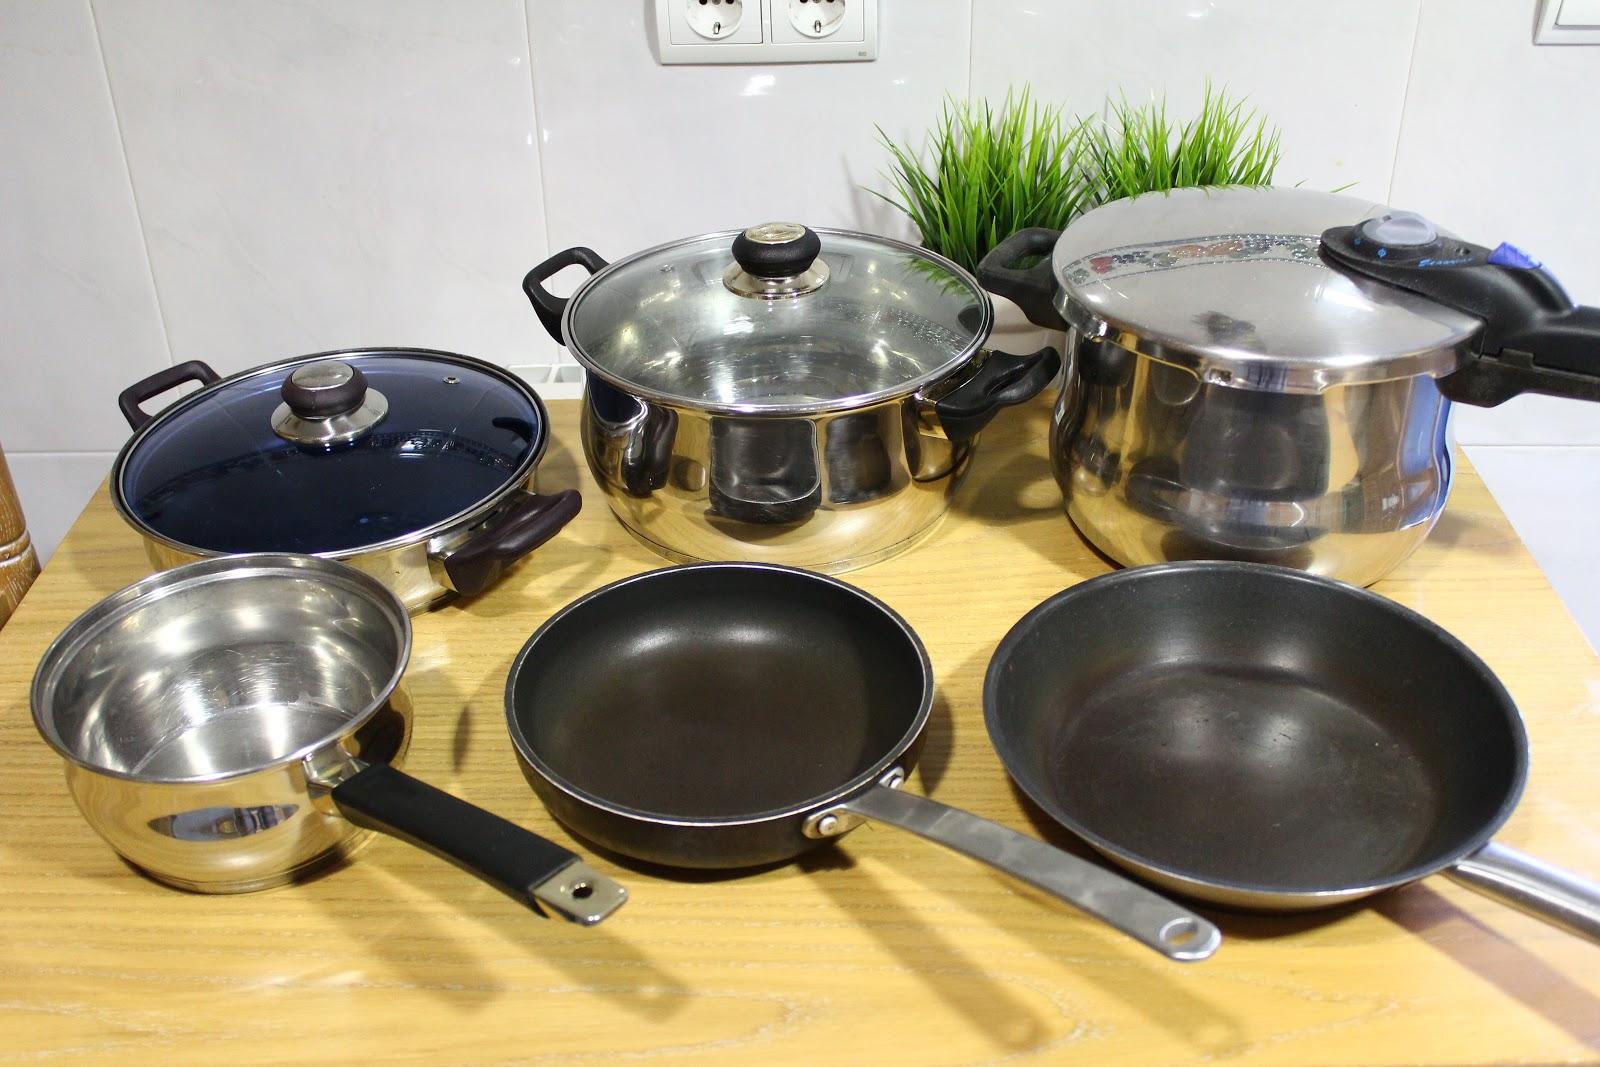 Miketouille herramientas de cocina reposter a for Herramientas cocina